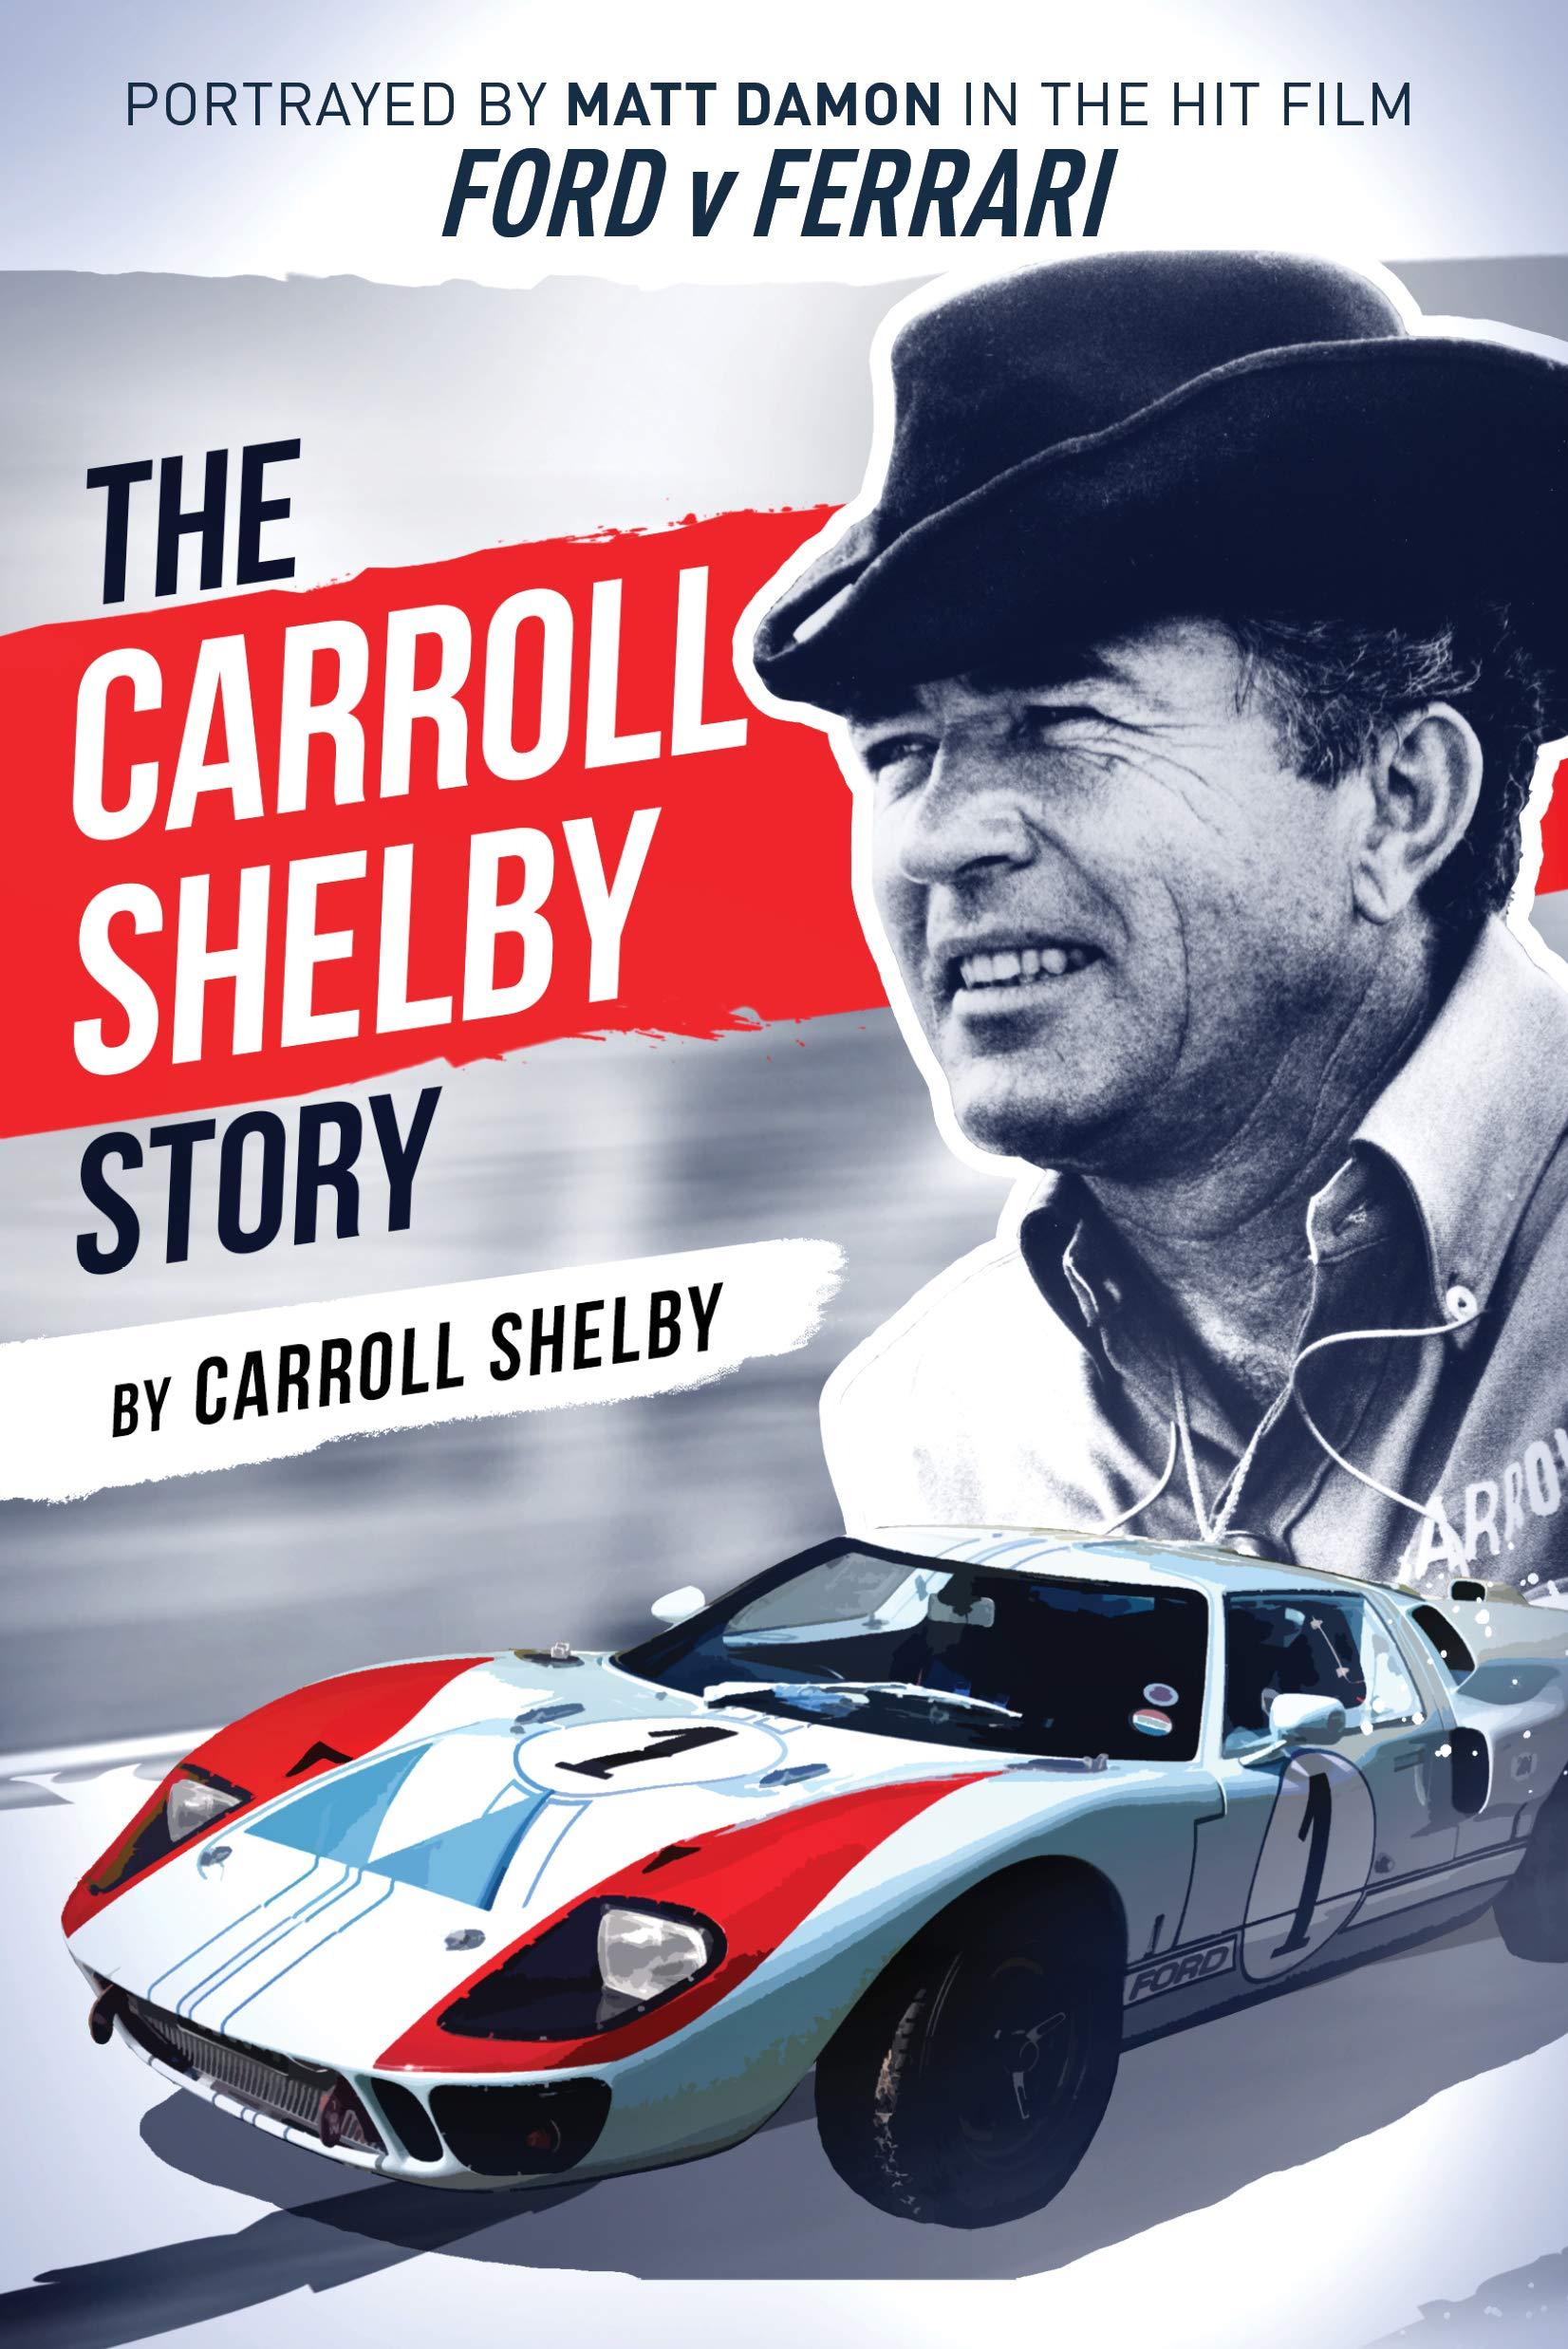 The Carroll Shelby Story Portrayed By Matt Damon In The Hit Film Ford V Ferrari Carroll Shelby 9781631682872 Amazon Com Books